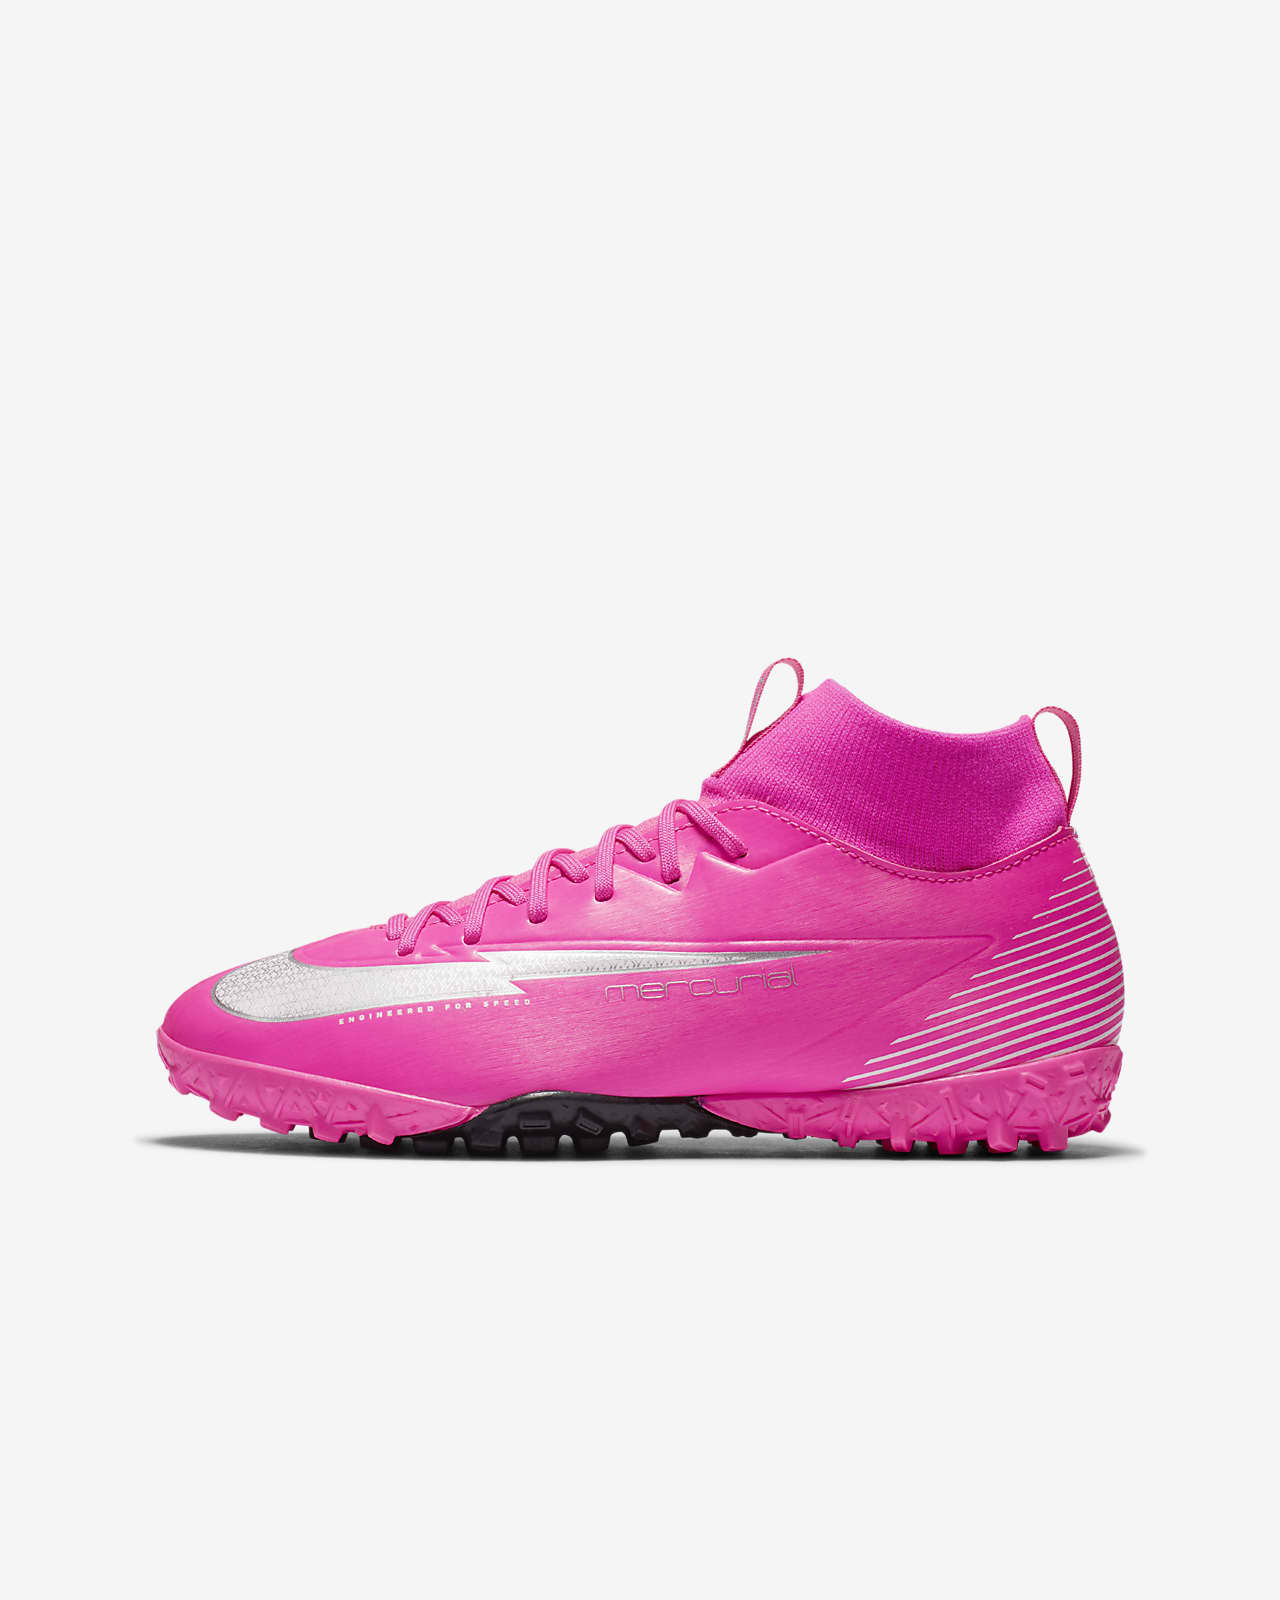 Calzado de fútbol para césped deportivo artificial (turf) para niños talla pequeña/grande Nike Jr. Mercurial Superfly 7 Academy Mbappé Rosa TF